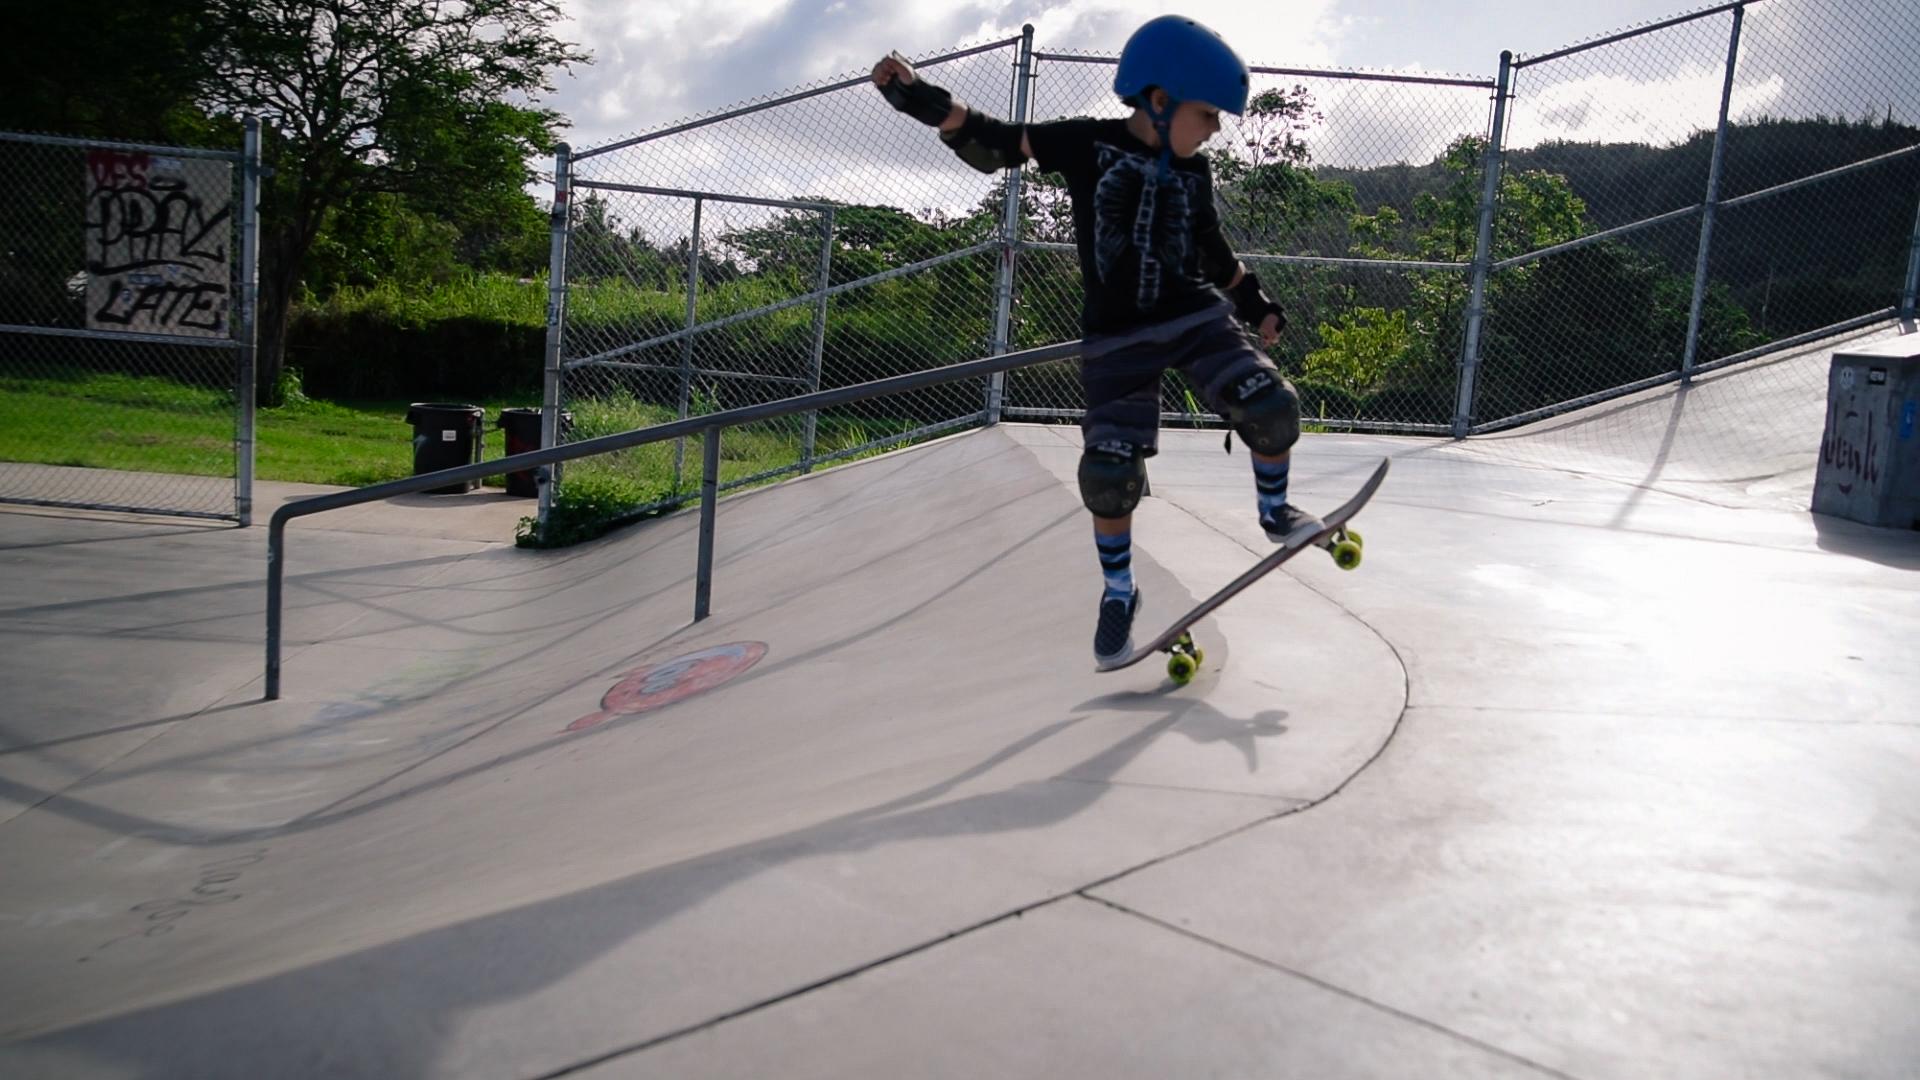 boy having fun on skateboard by springfield illinois photographer lydia stuemke